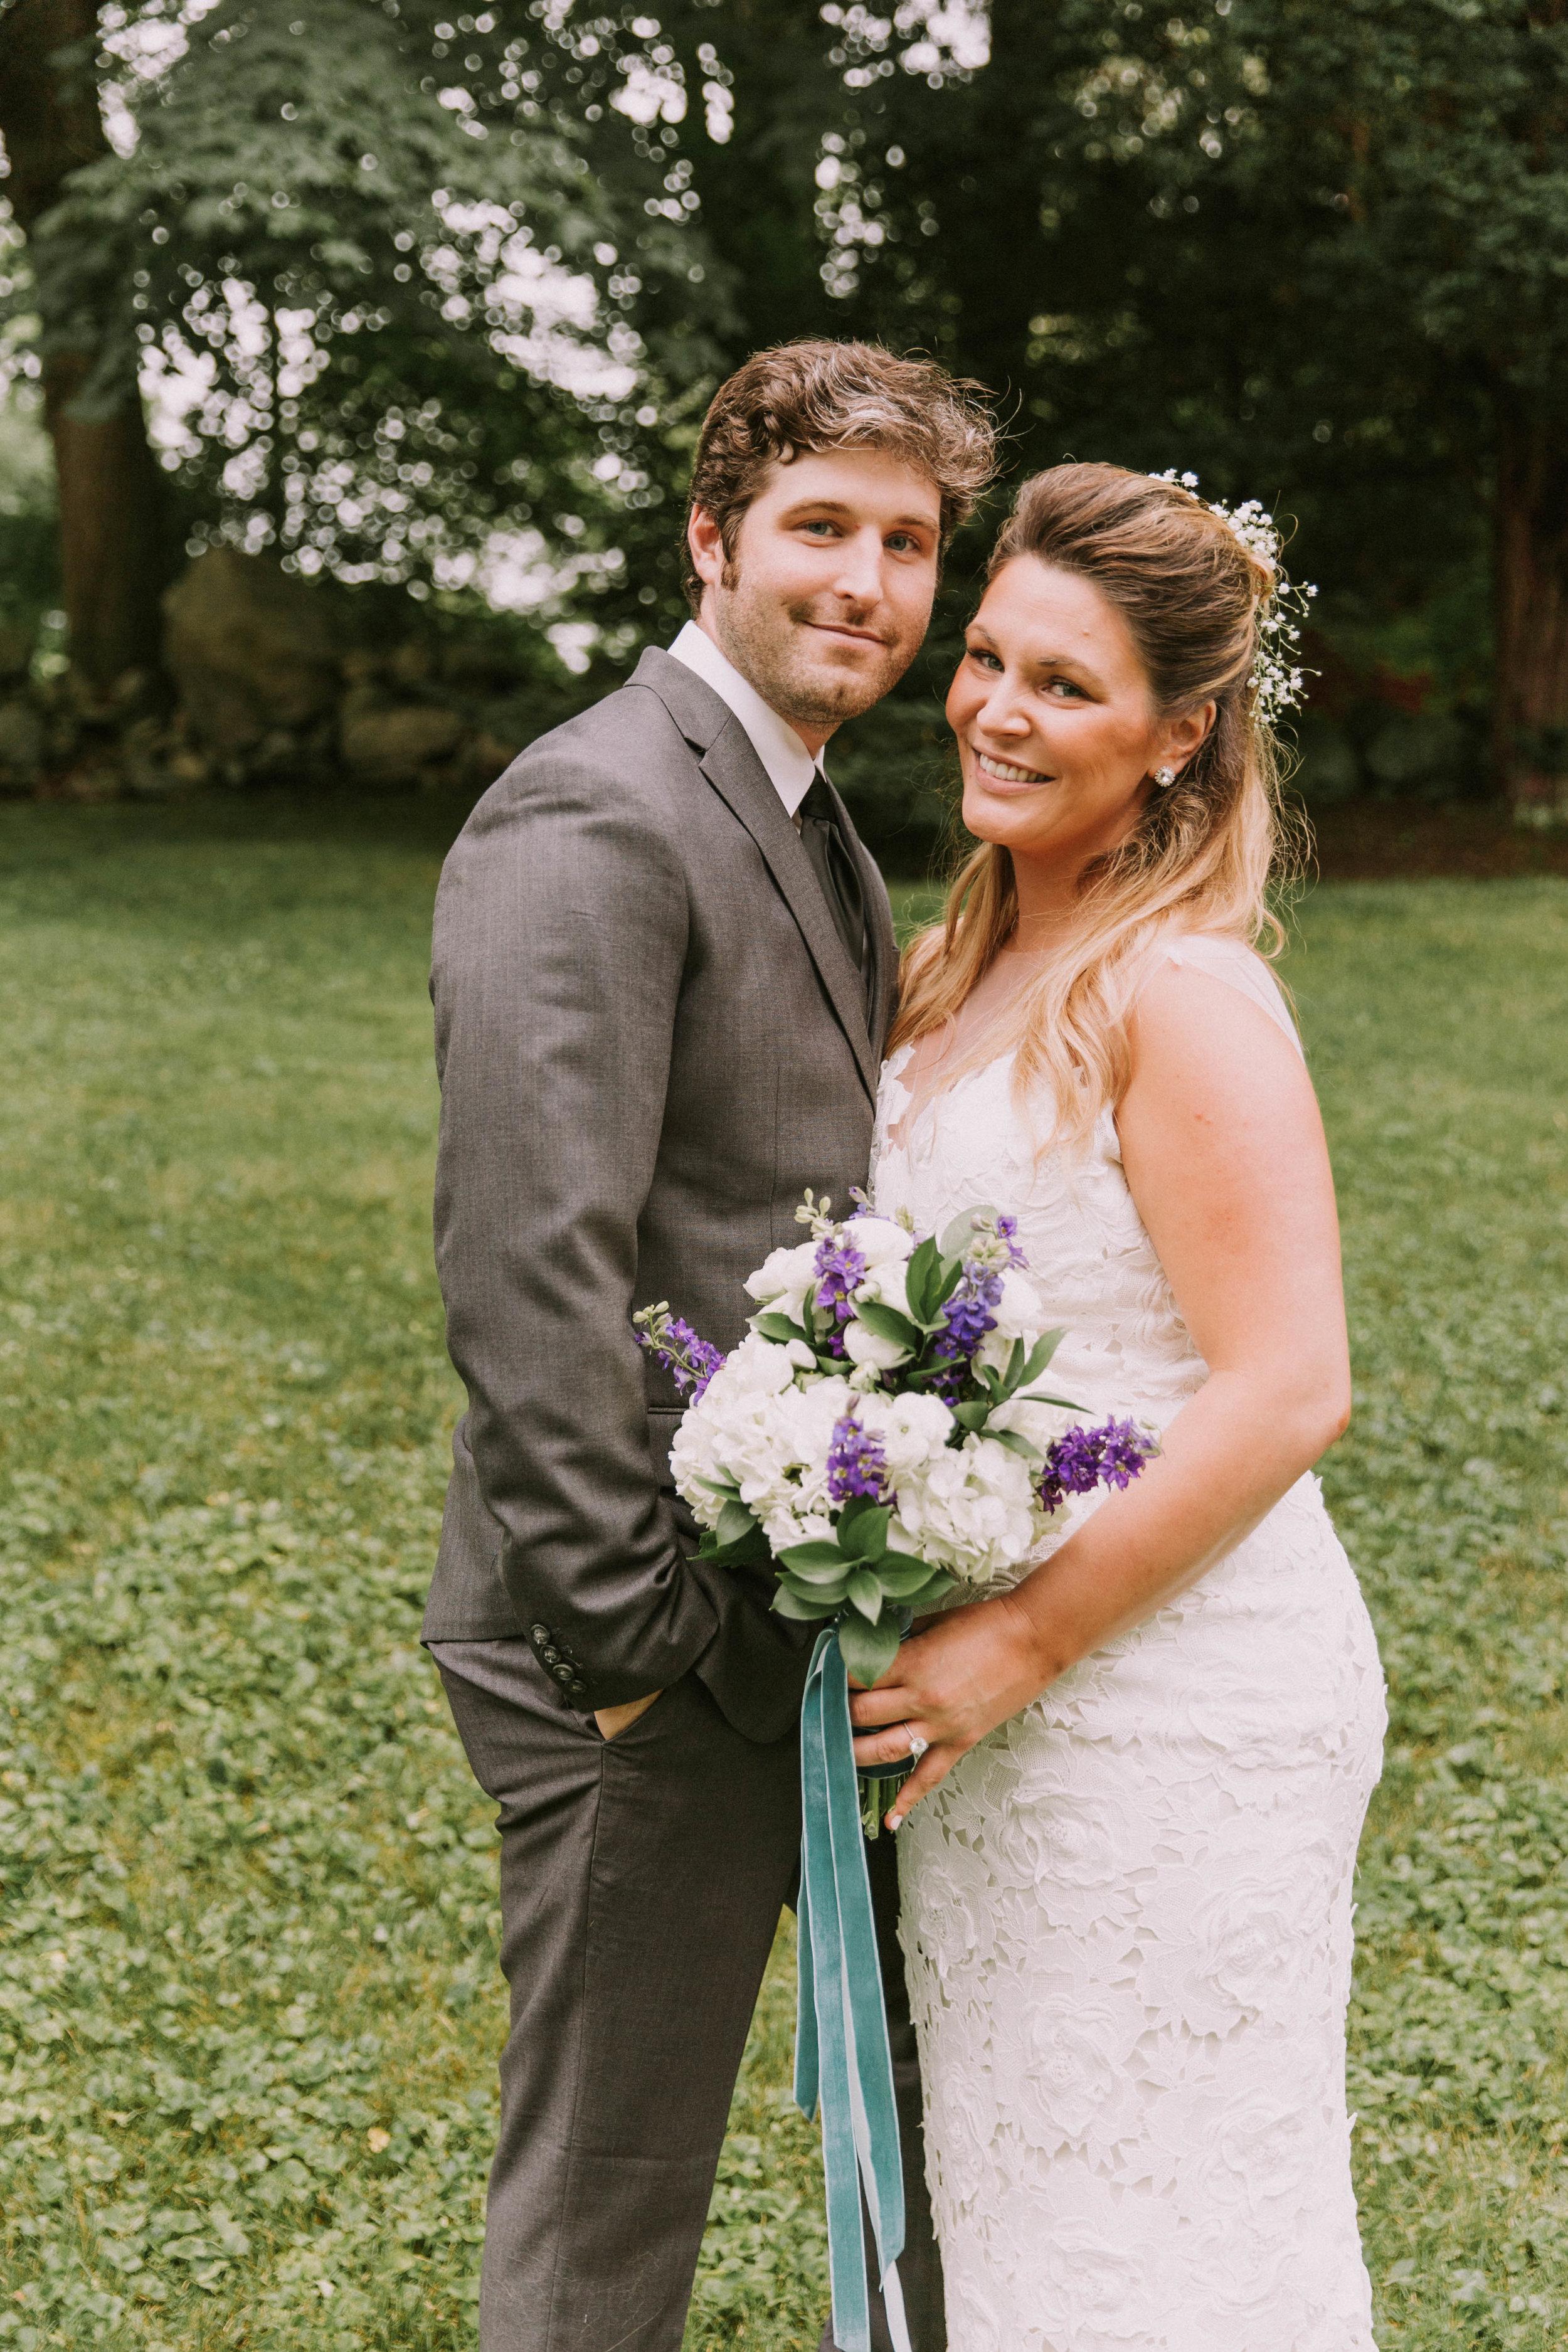 spitale-elopement-blog-12-of-18.jpg